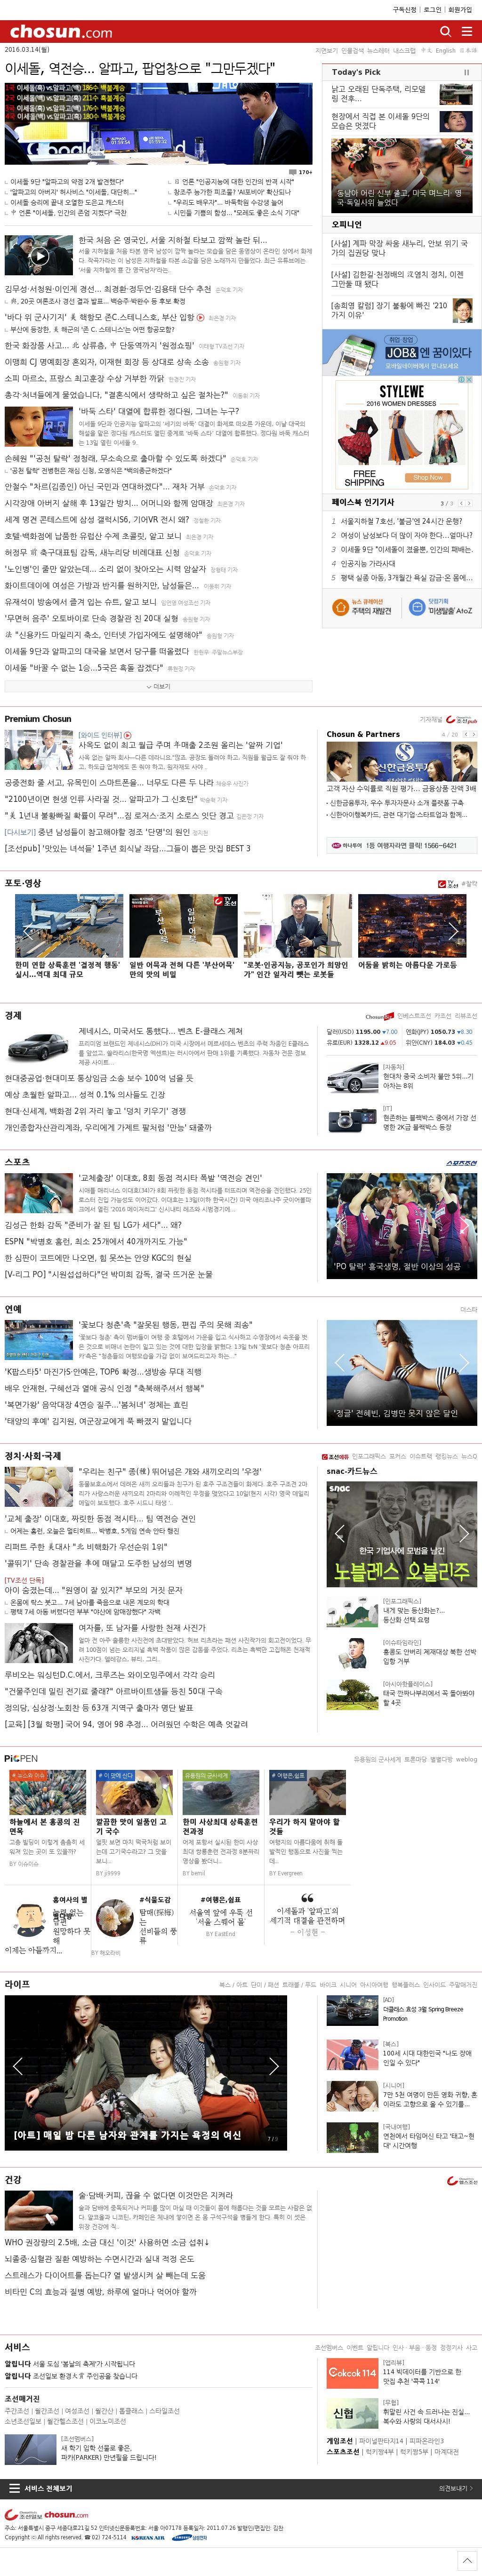 chosun.com at Sunday March 13, 2016, 3:03 p.m. UTC